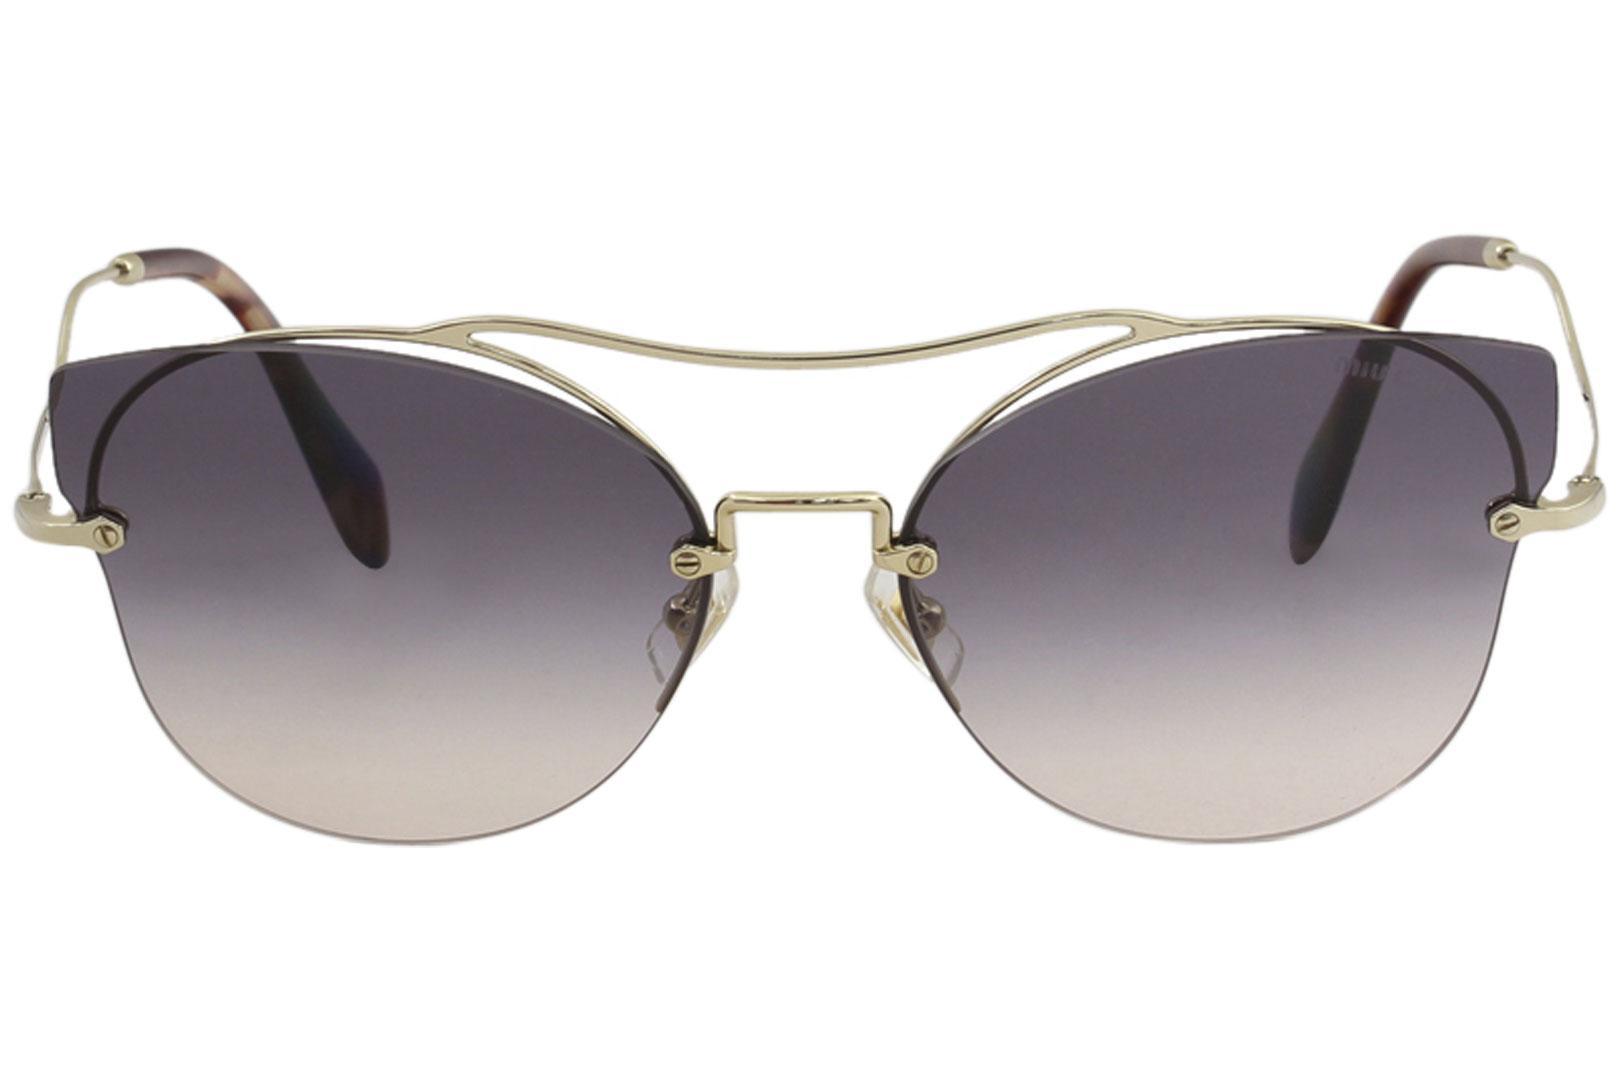 41633ad45c9 Miu Miu Women s SMU52S SMU 52S Fashion Cat Eye Sunglasses